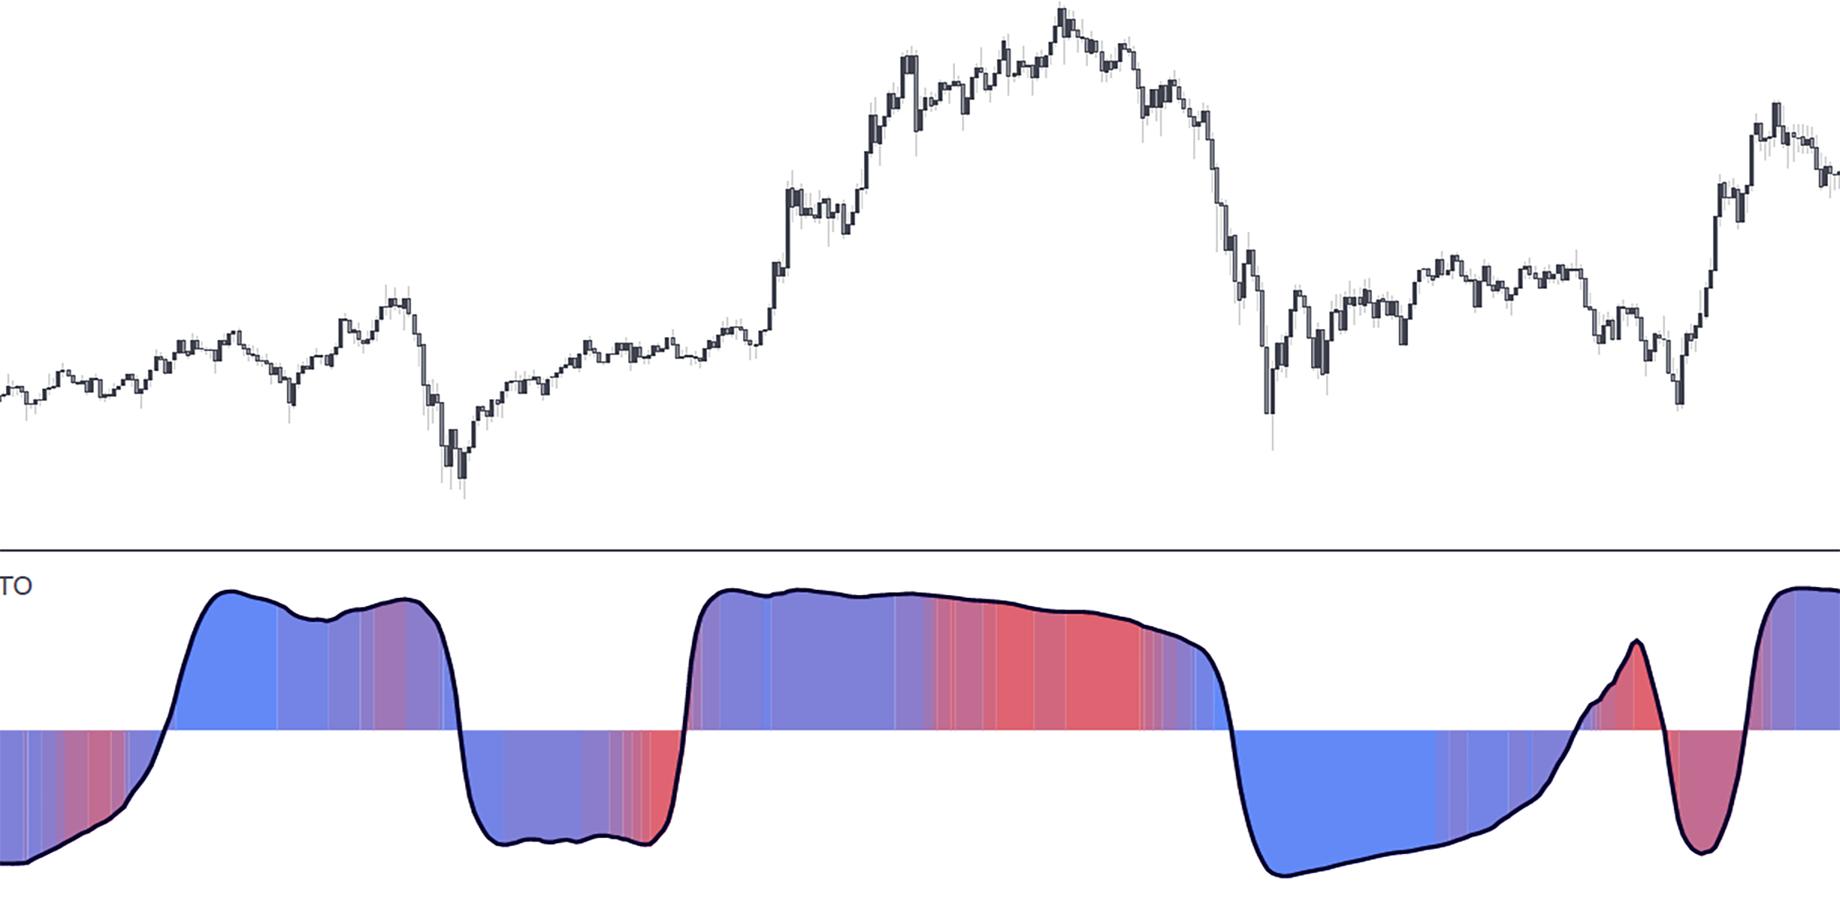 ArcTan Oscillator — A New Indicator For Technical Analysis